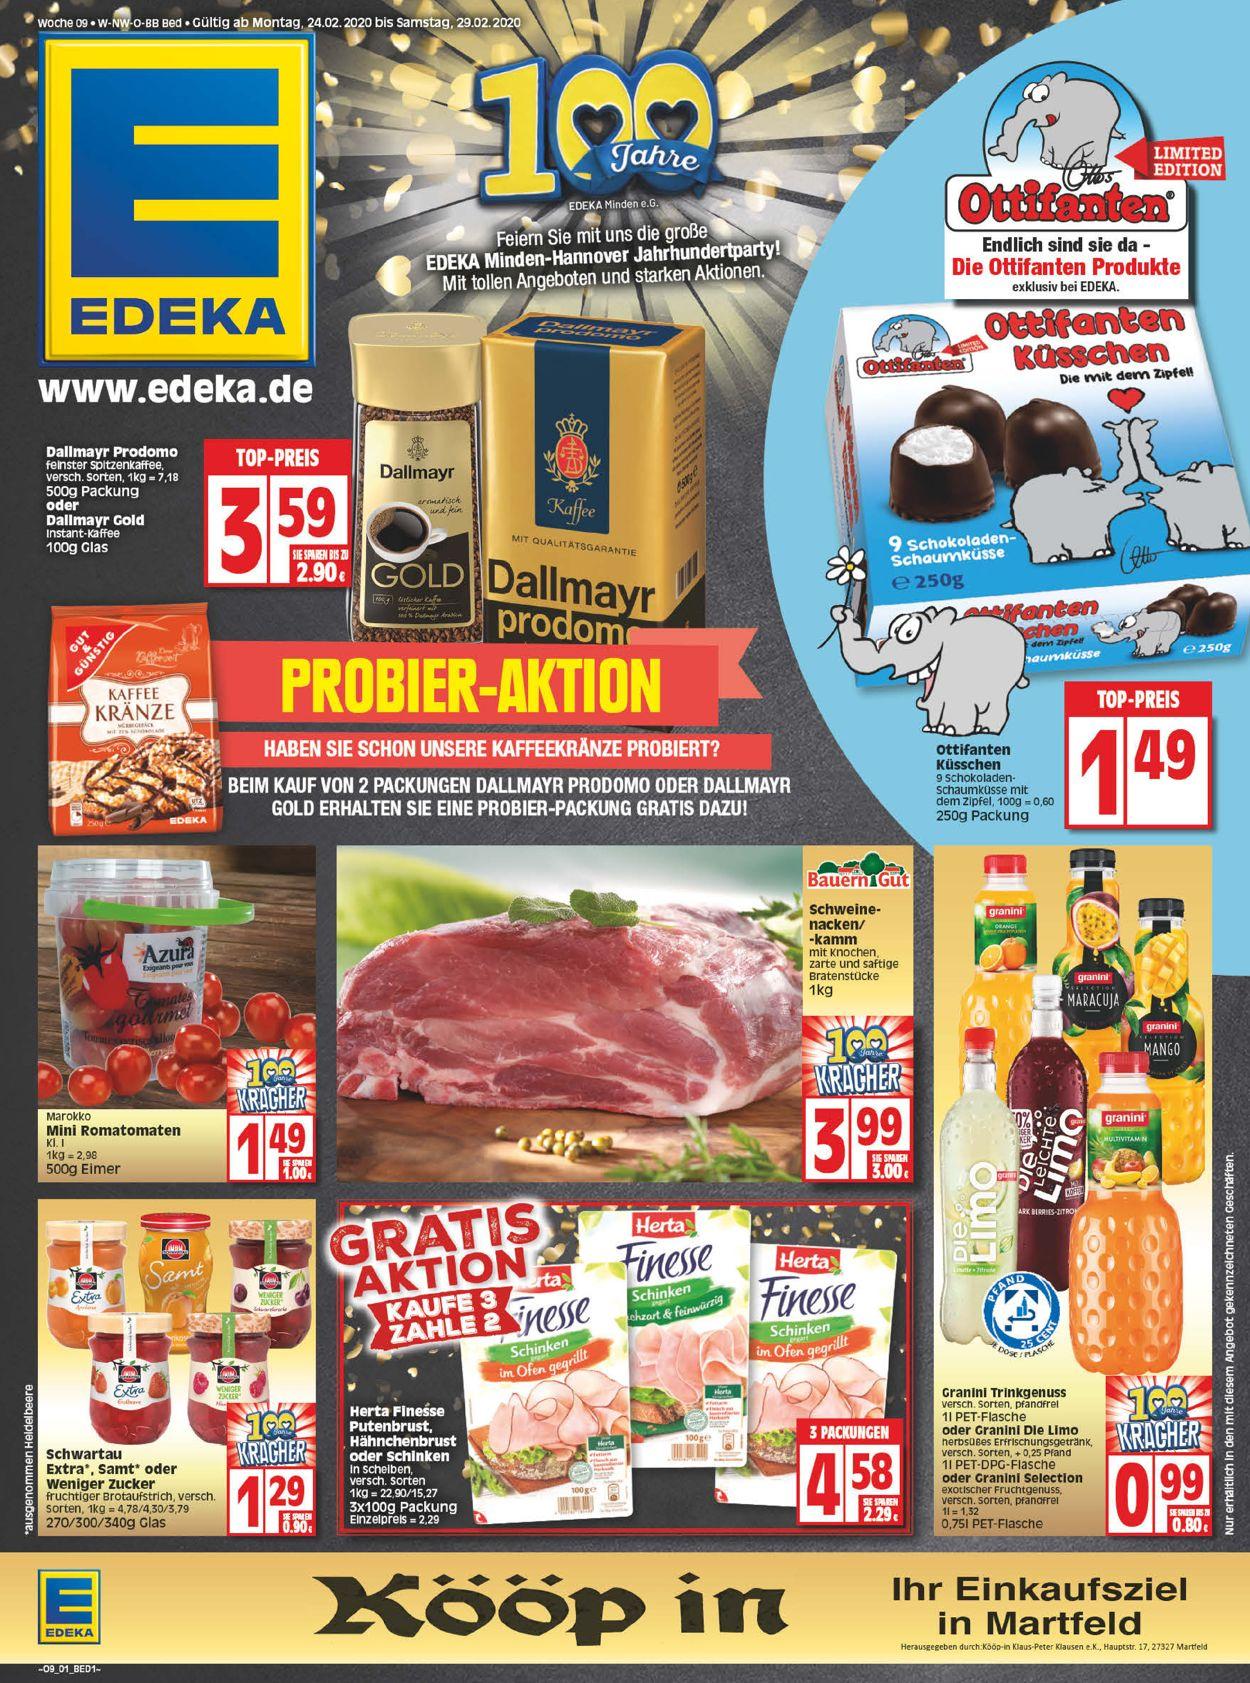 Edeka Prospekt - Aktuell vom 24.02-29.02.2020